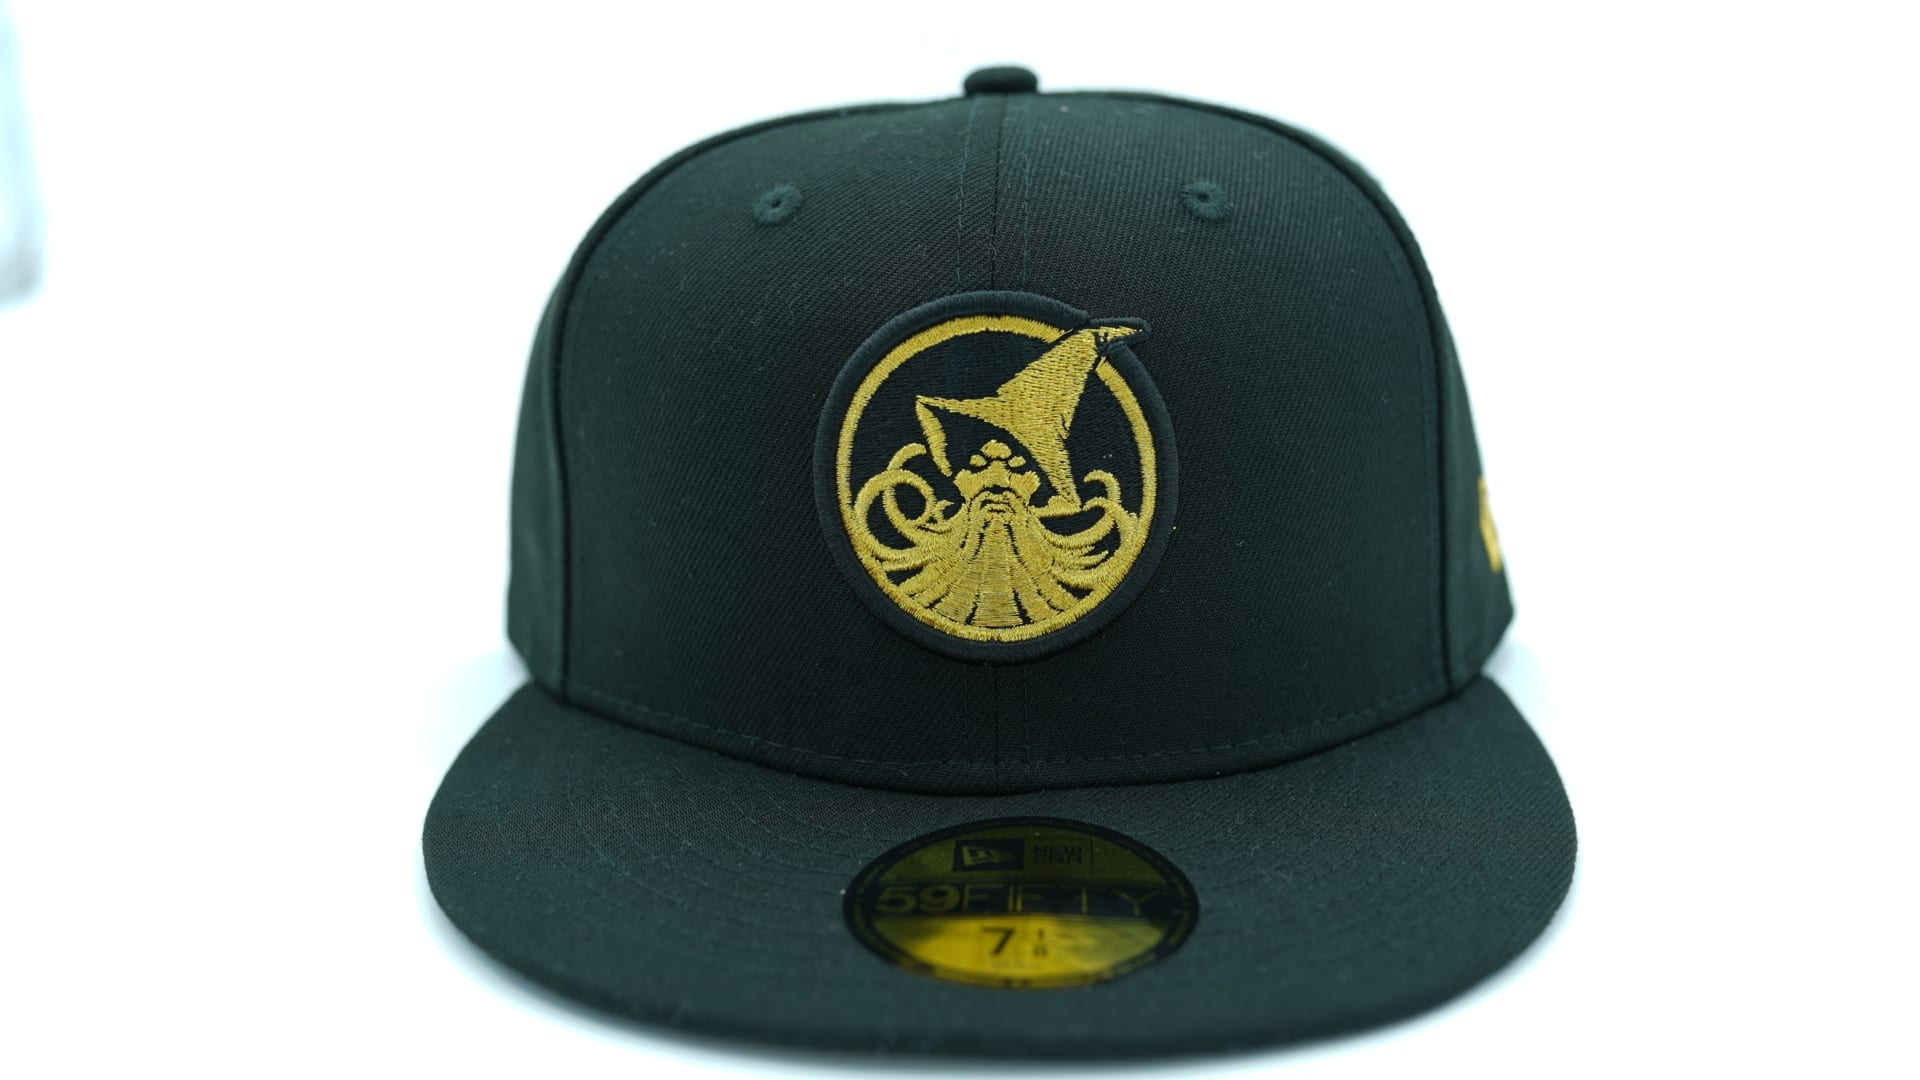 custom-heat-59fifty-new-era-fitted-baseball-cap-pink-teal_2